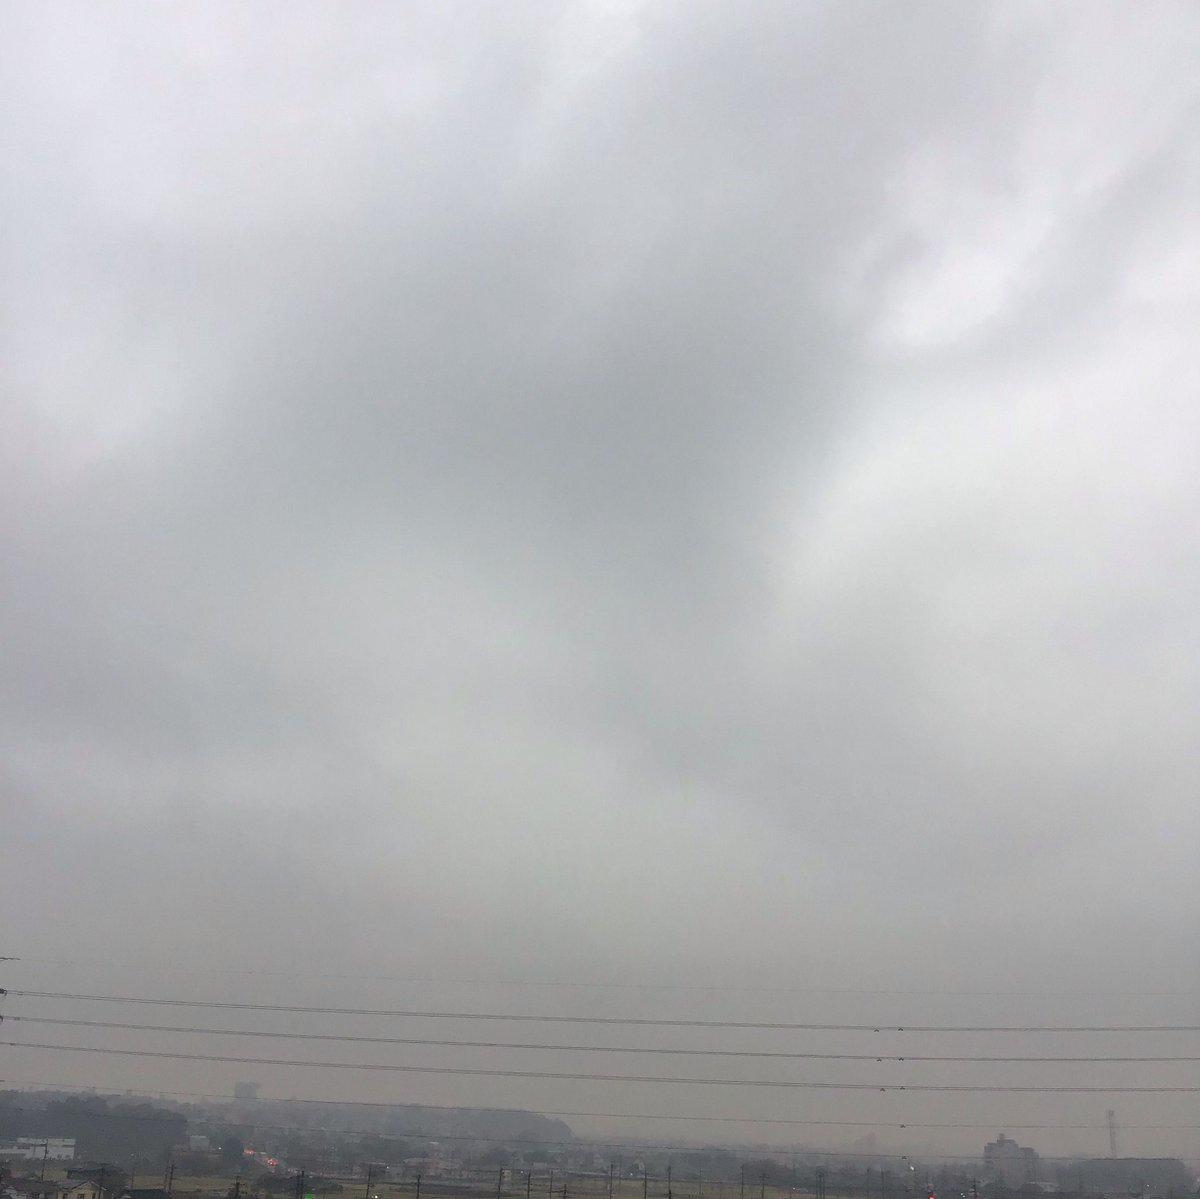 test ツイッターメディア - おはようございます^ ^ 12月2日(月)尾張旭市の天気予報は雨のち晴☔️→☀️ 最高気温…15℃(昨日より-1℃) 最低気温…10℃ 紫外線指数…弱い 洗濯指数…室内に干すか乾燥機がお勧め 服装指数…セーターが必要になりそうね 雷注意報がでています  #ハザードマップ https://t.co/EWnvKX80fc https://t.co/KiOyPJ2Vhp